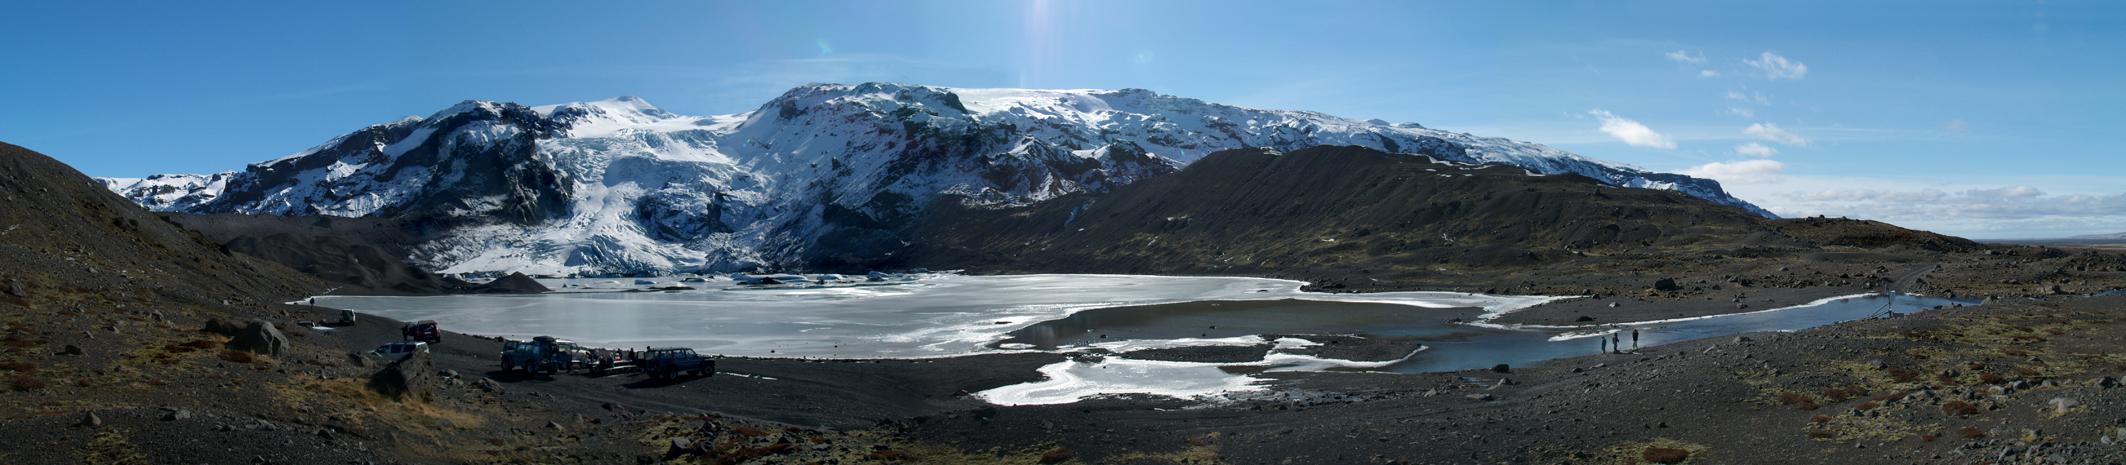 Icefall Gigjokull